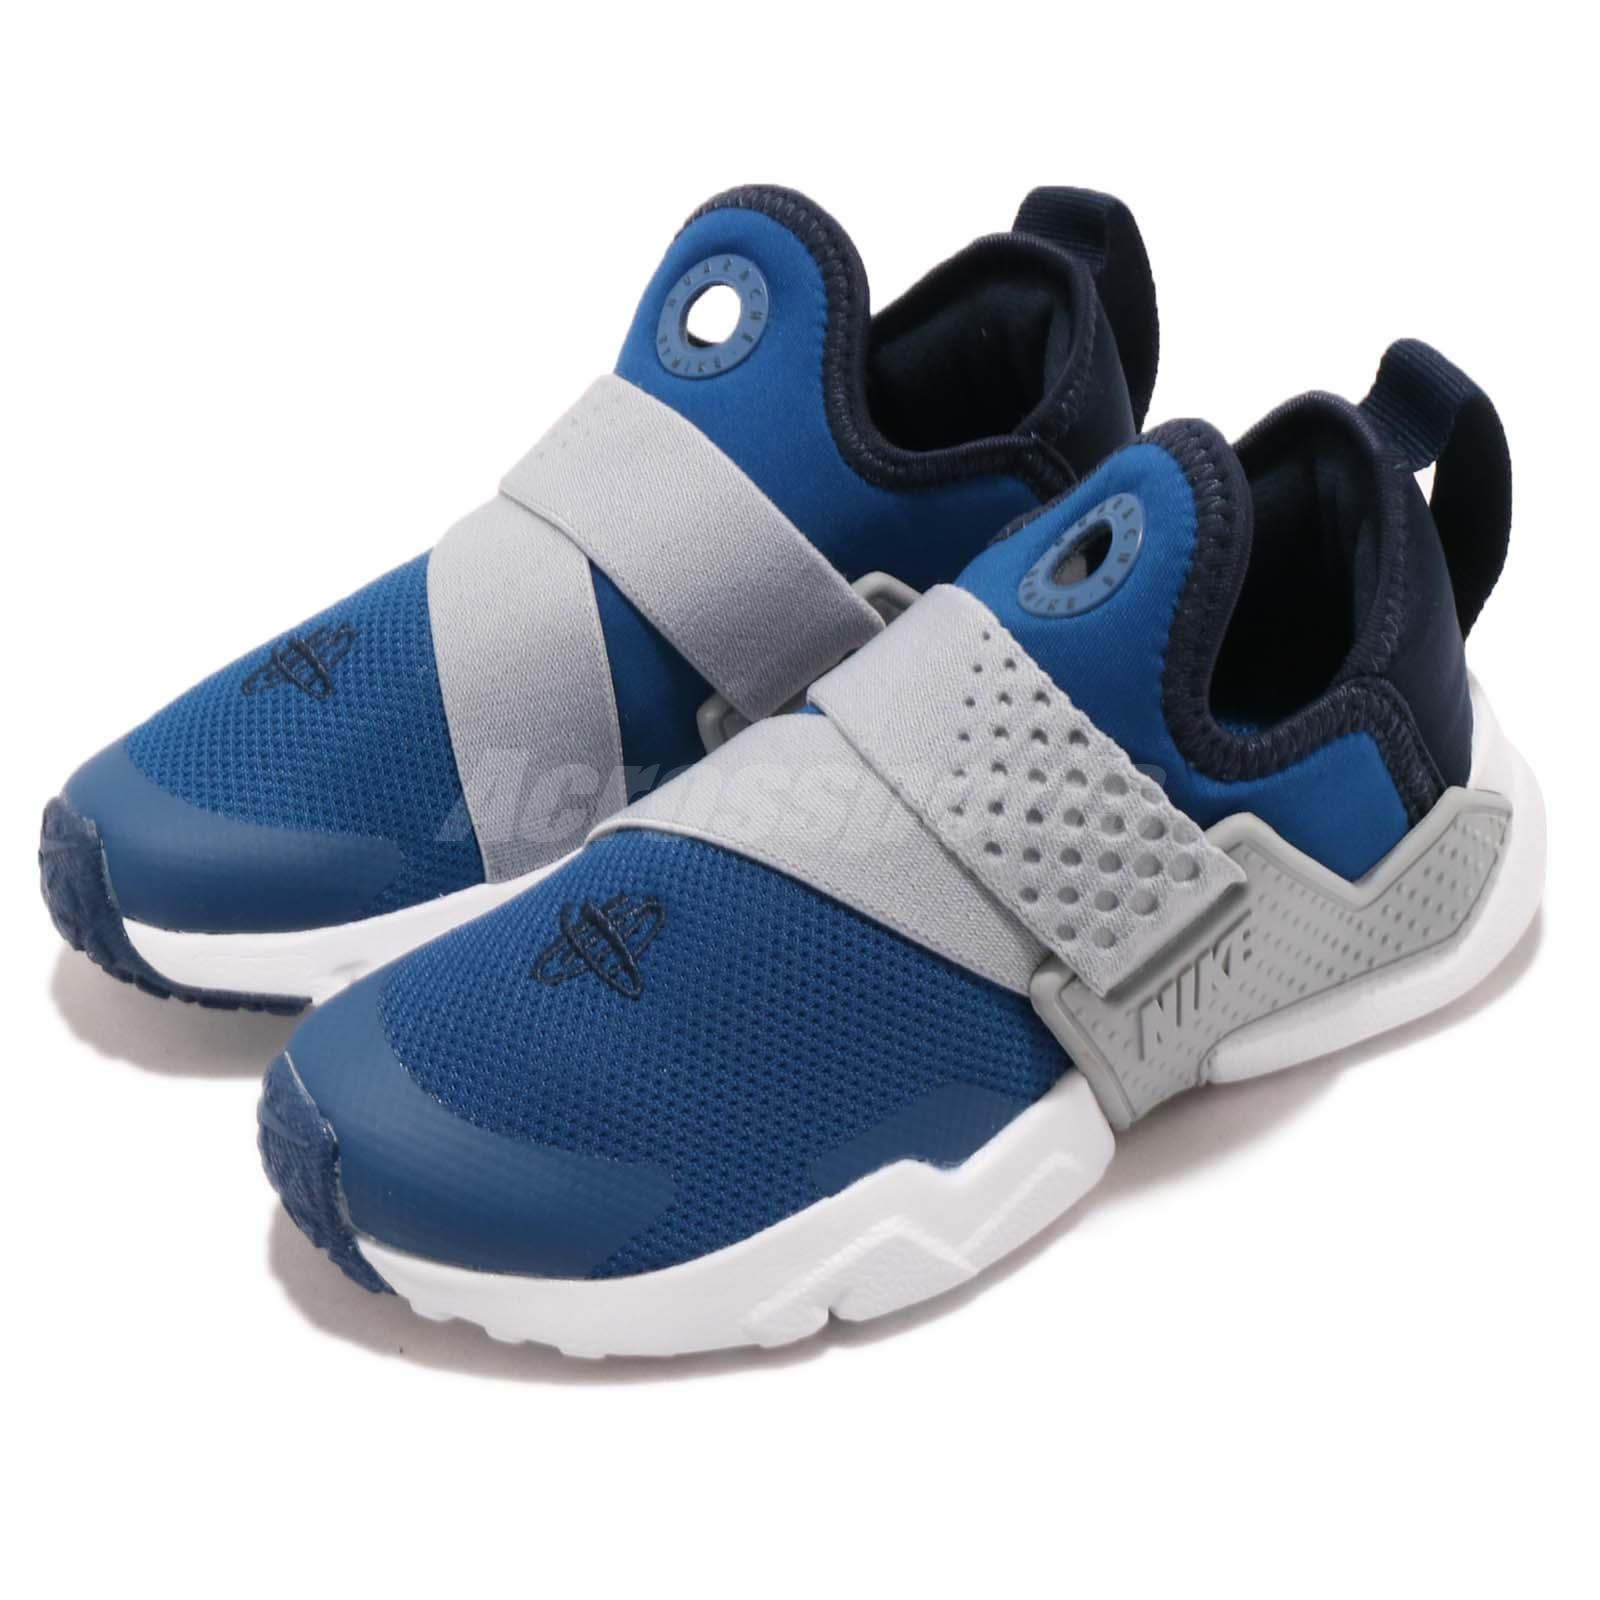 b340c4eed450 Details about Nike Huarache Extreme PS Blue Grey Preschool Boy Girl Slip On  Shoes AH7826-401